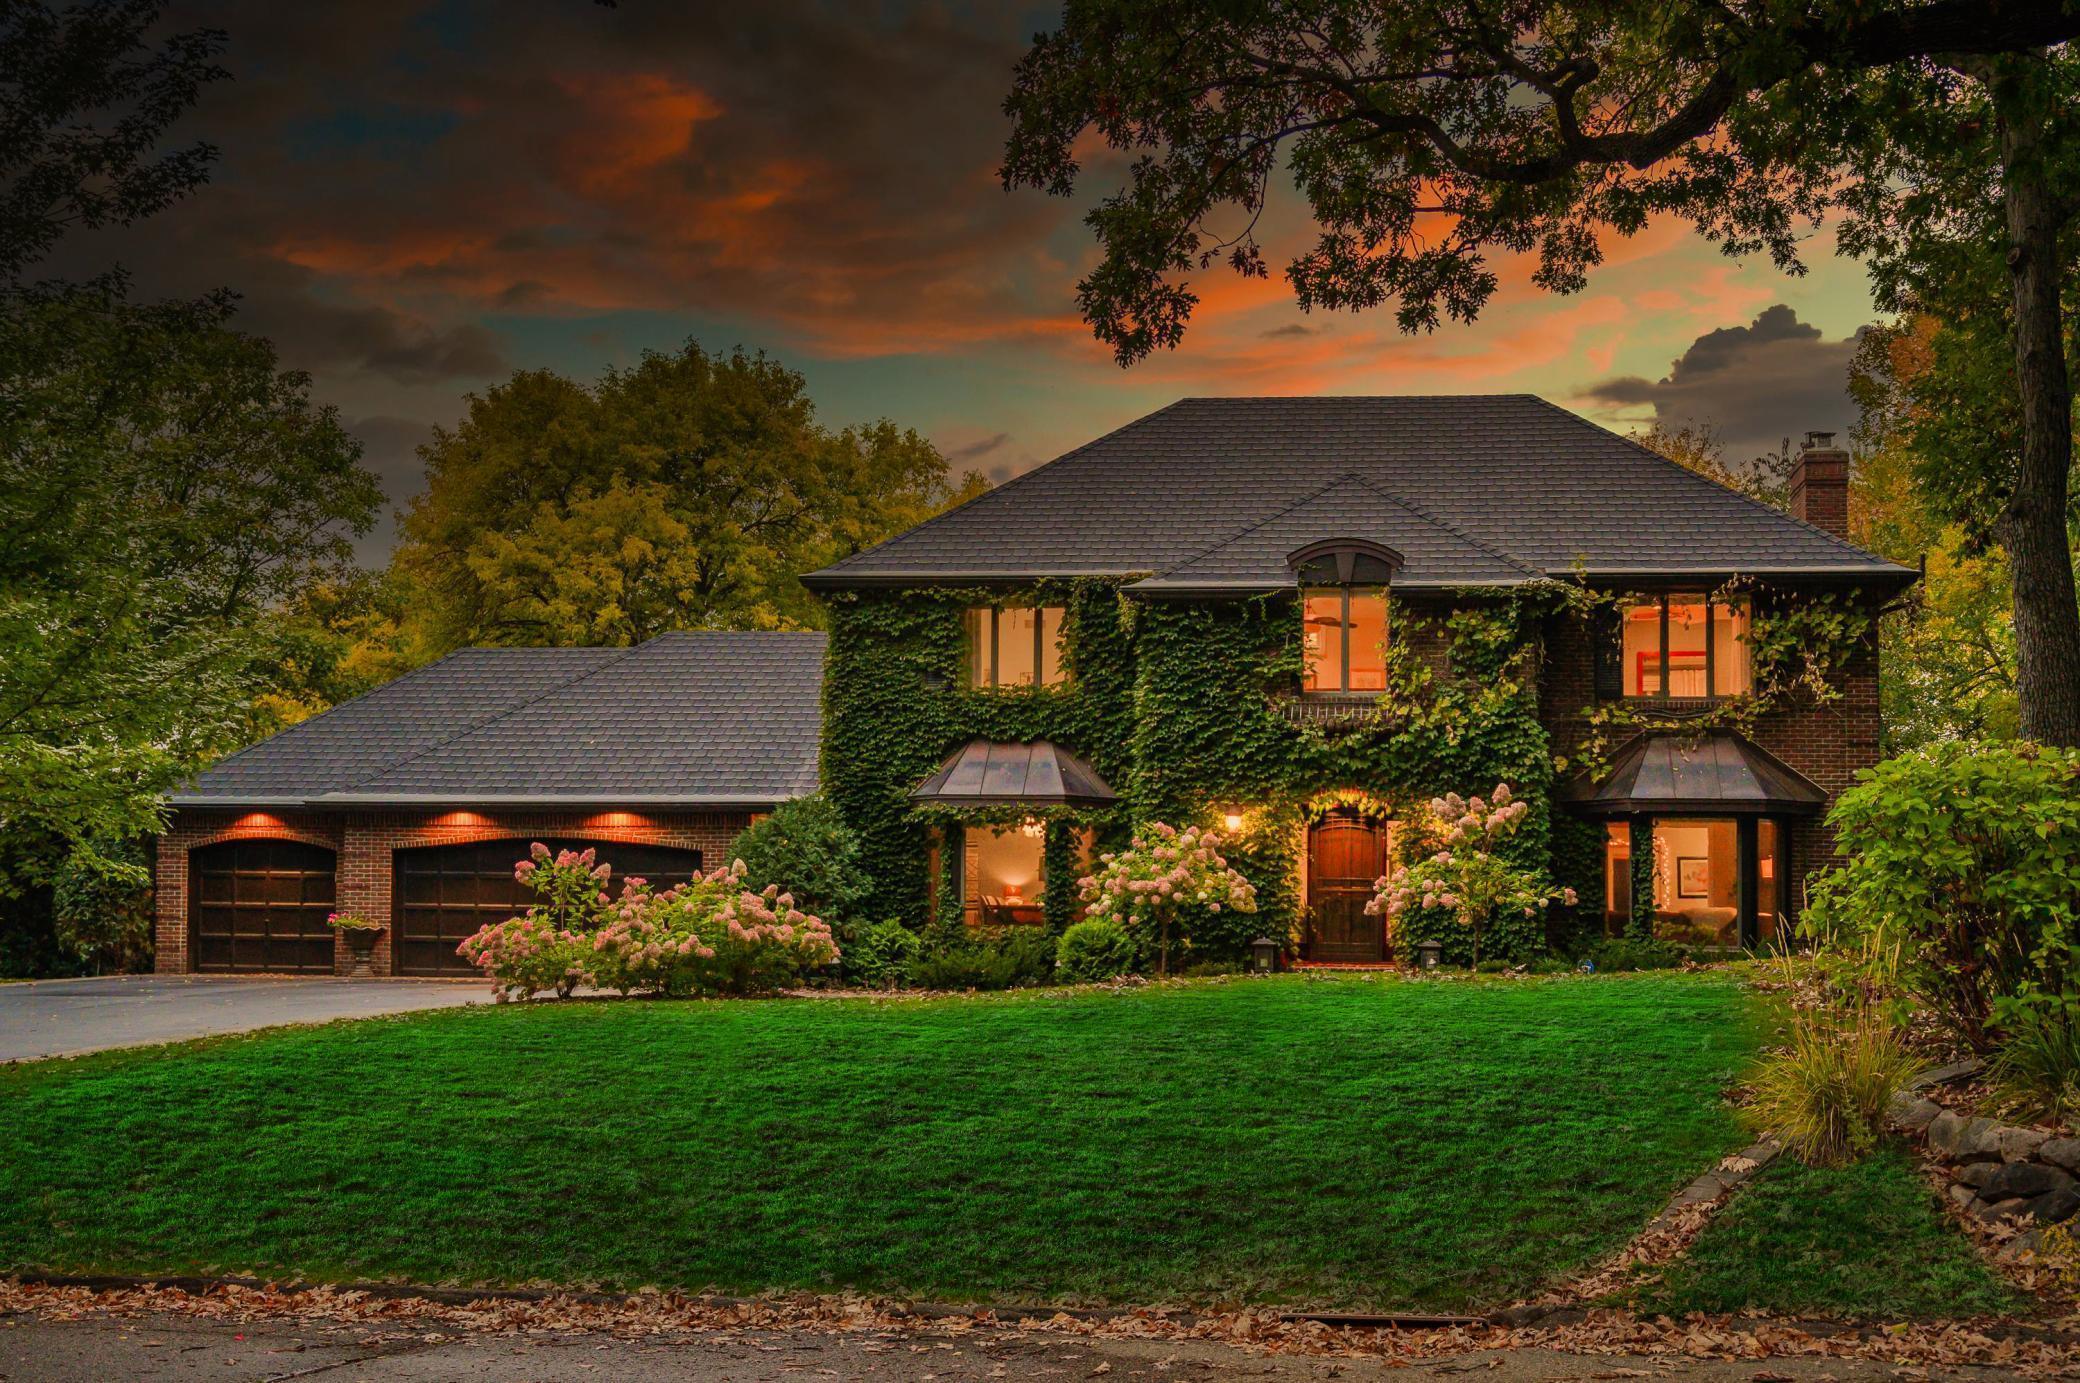 2100 Dwight Lane Property Photo - Minnetonka, MN real estate listing